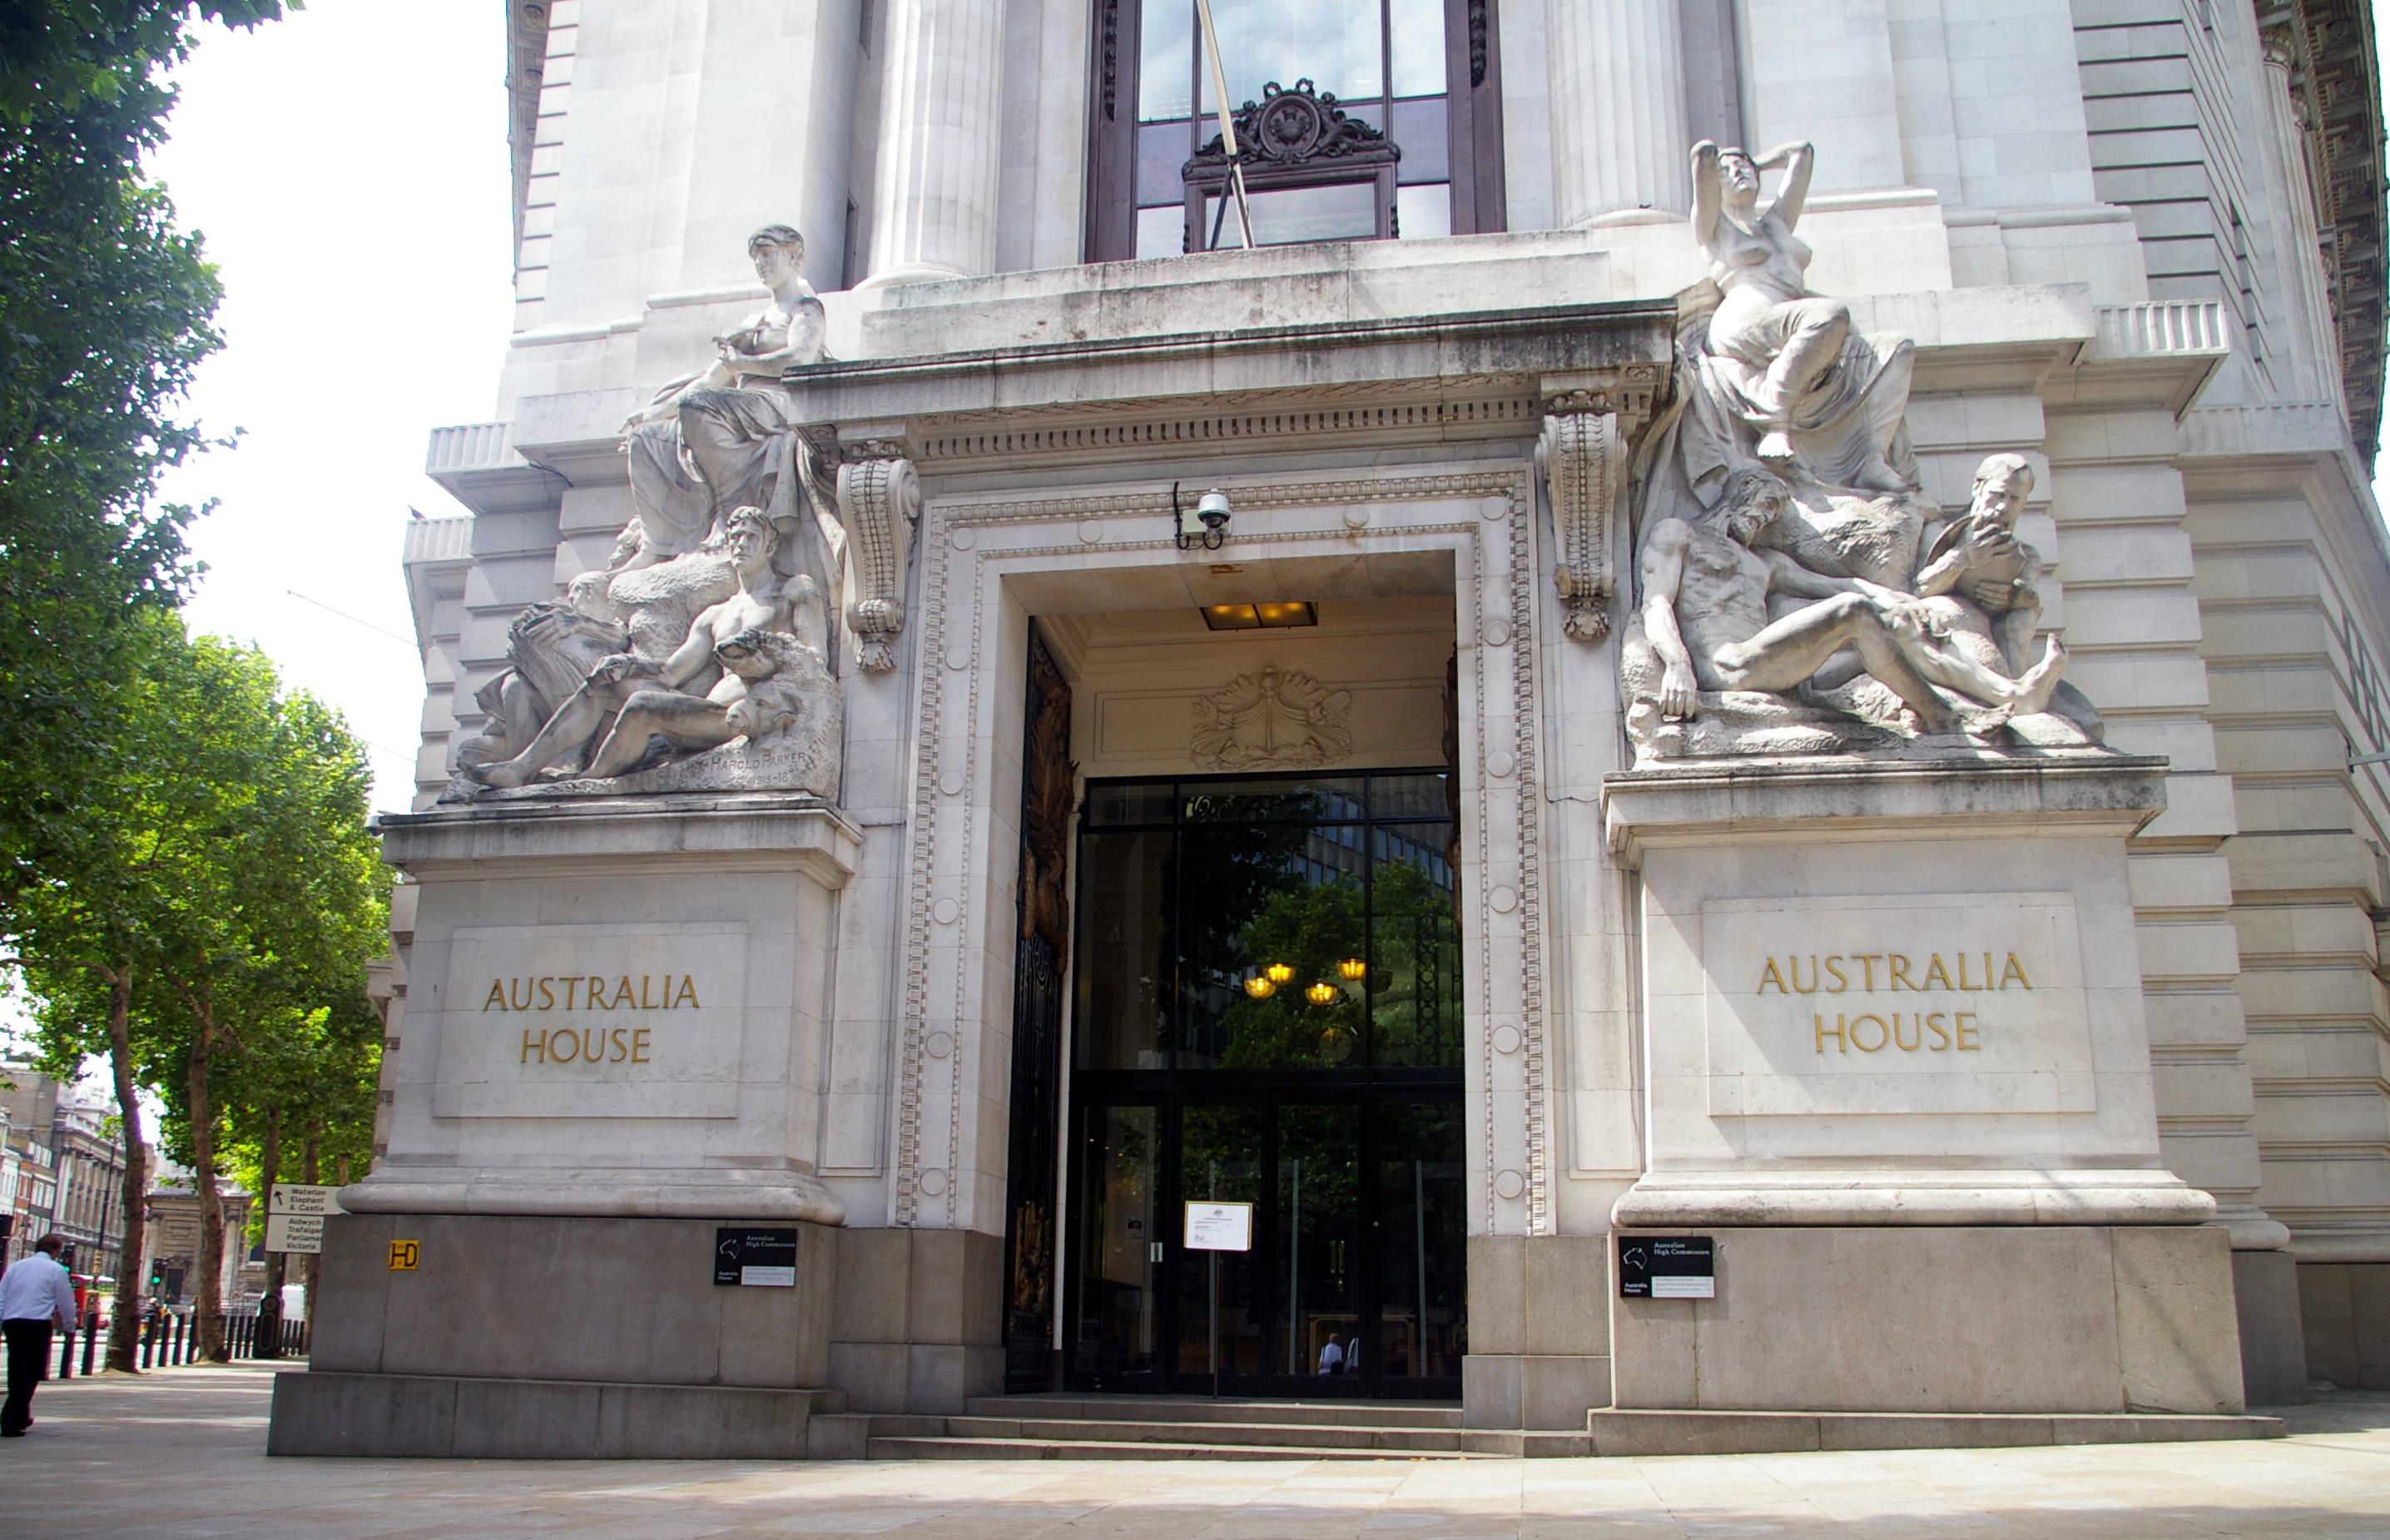 Где снимали Гарри Поттера Банк Гринготтс Gringotts Wizarding Bank Australia House